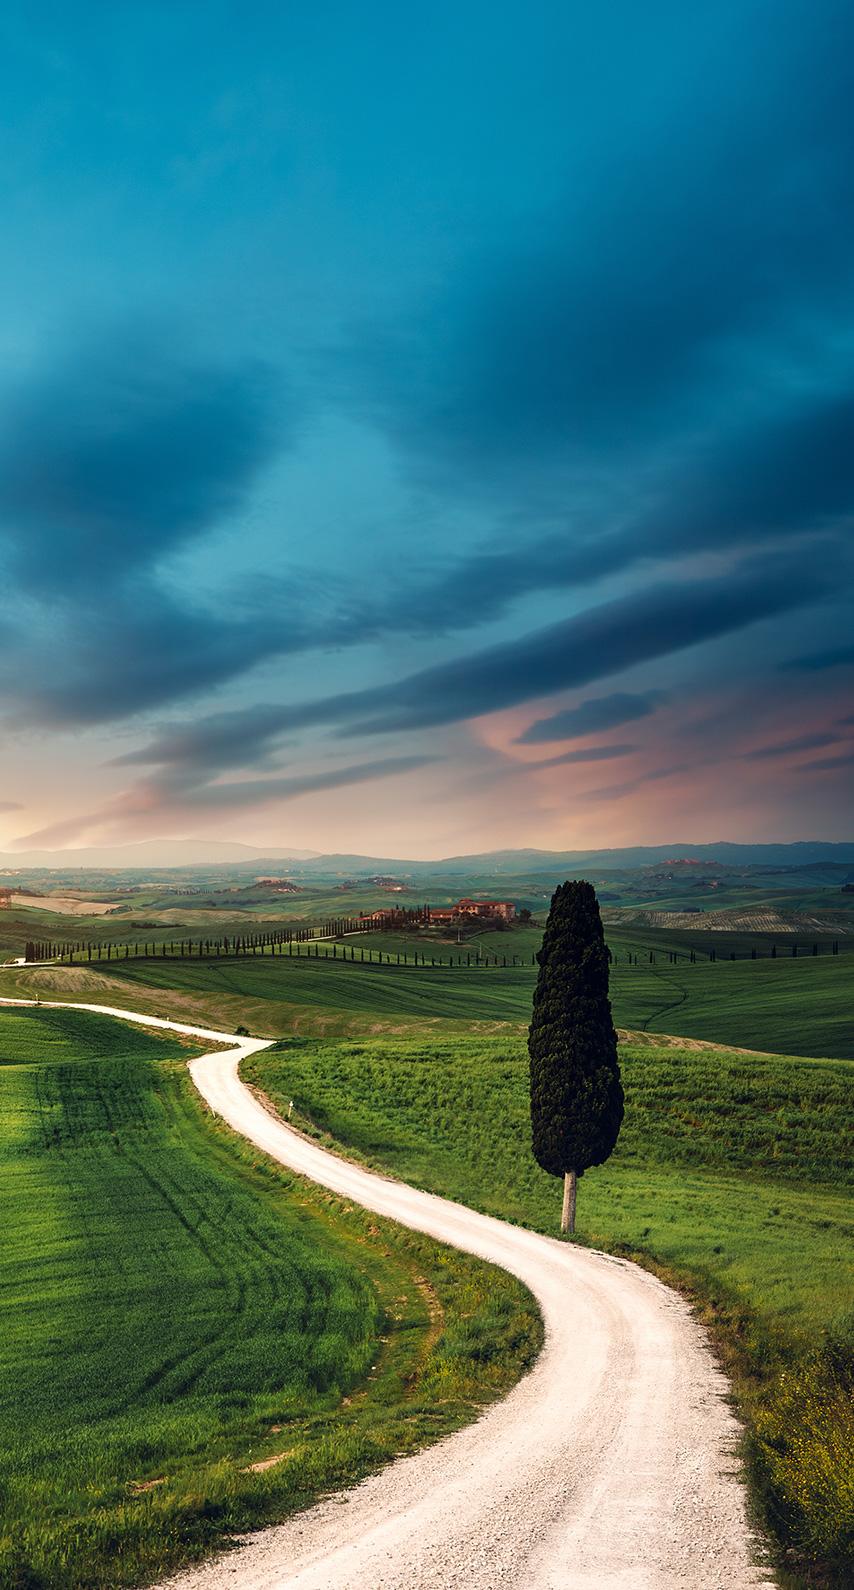 cropland, highway